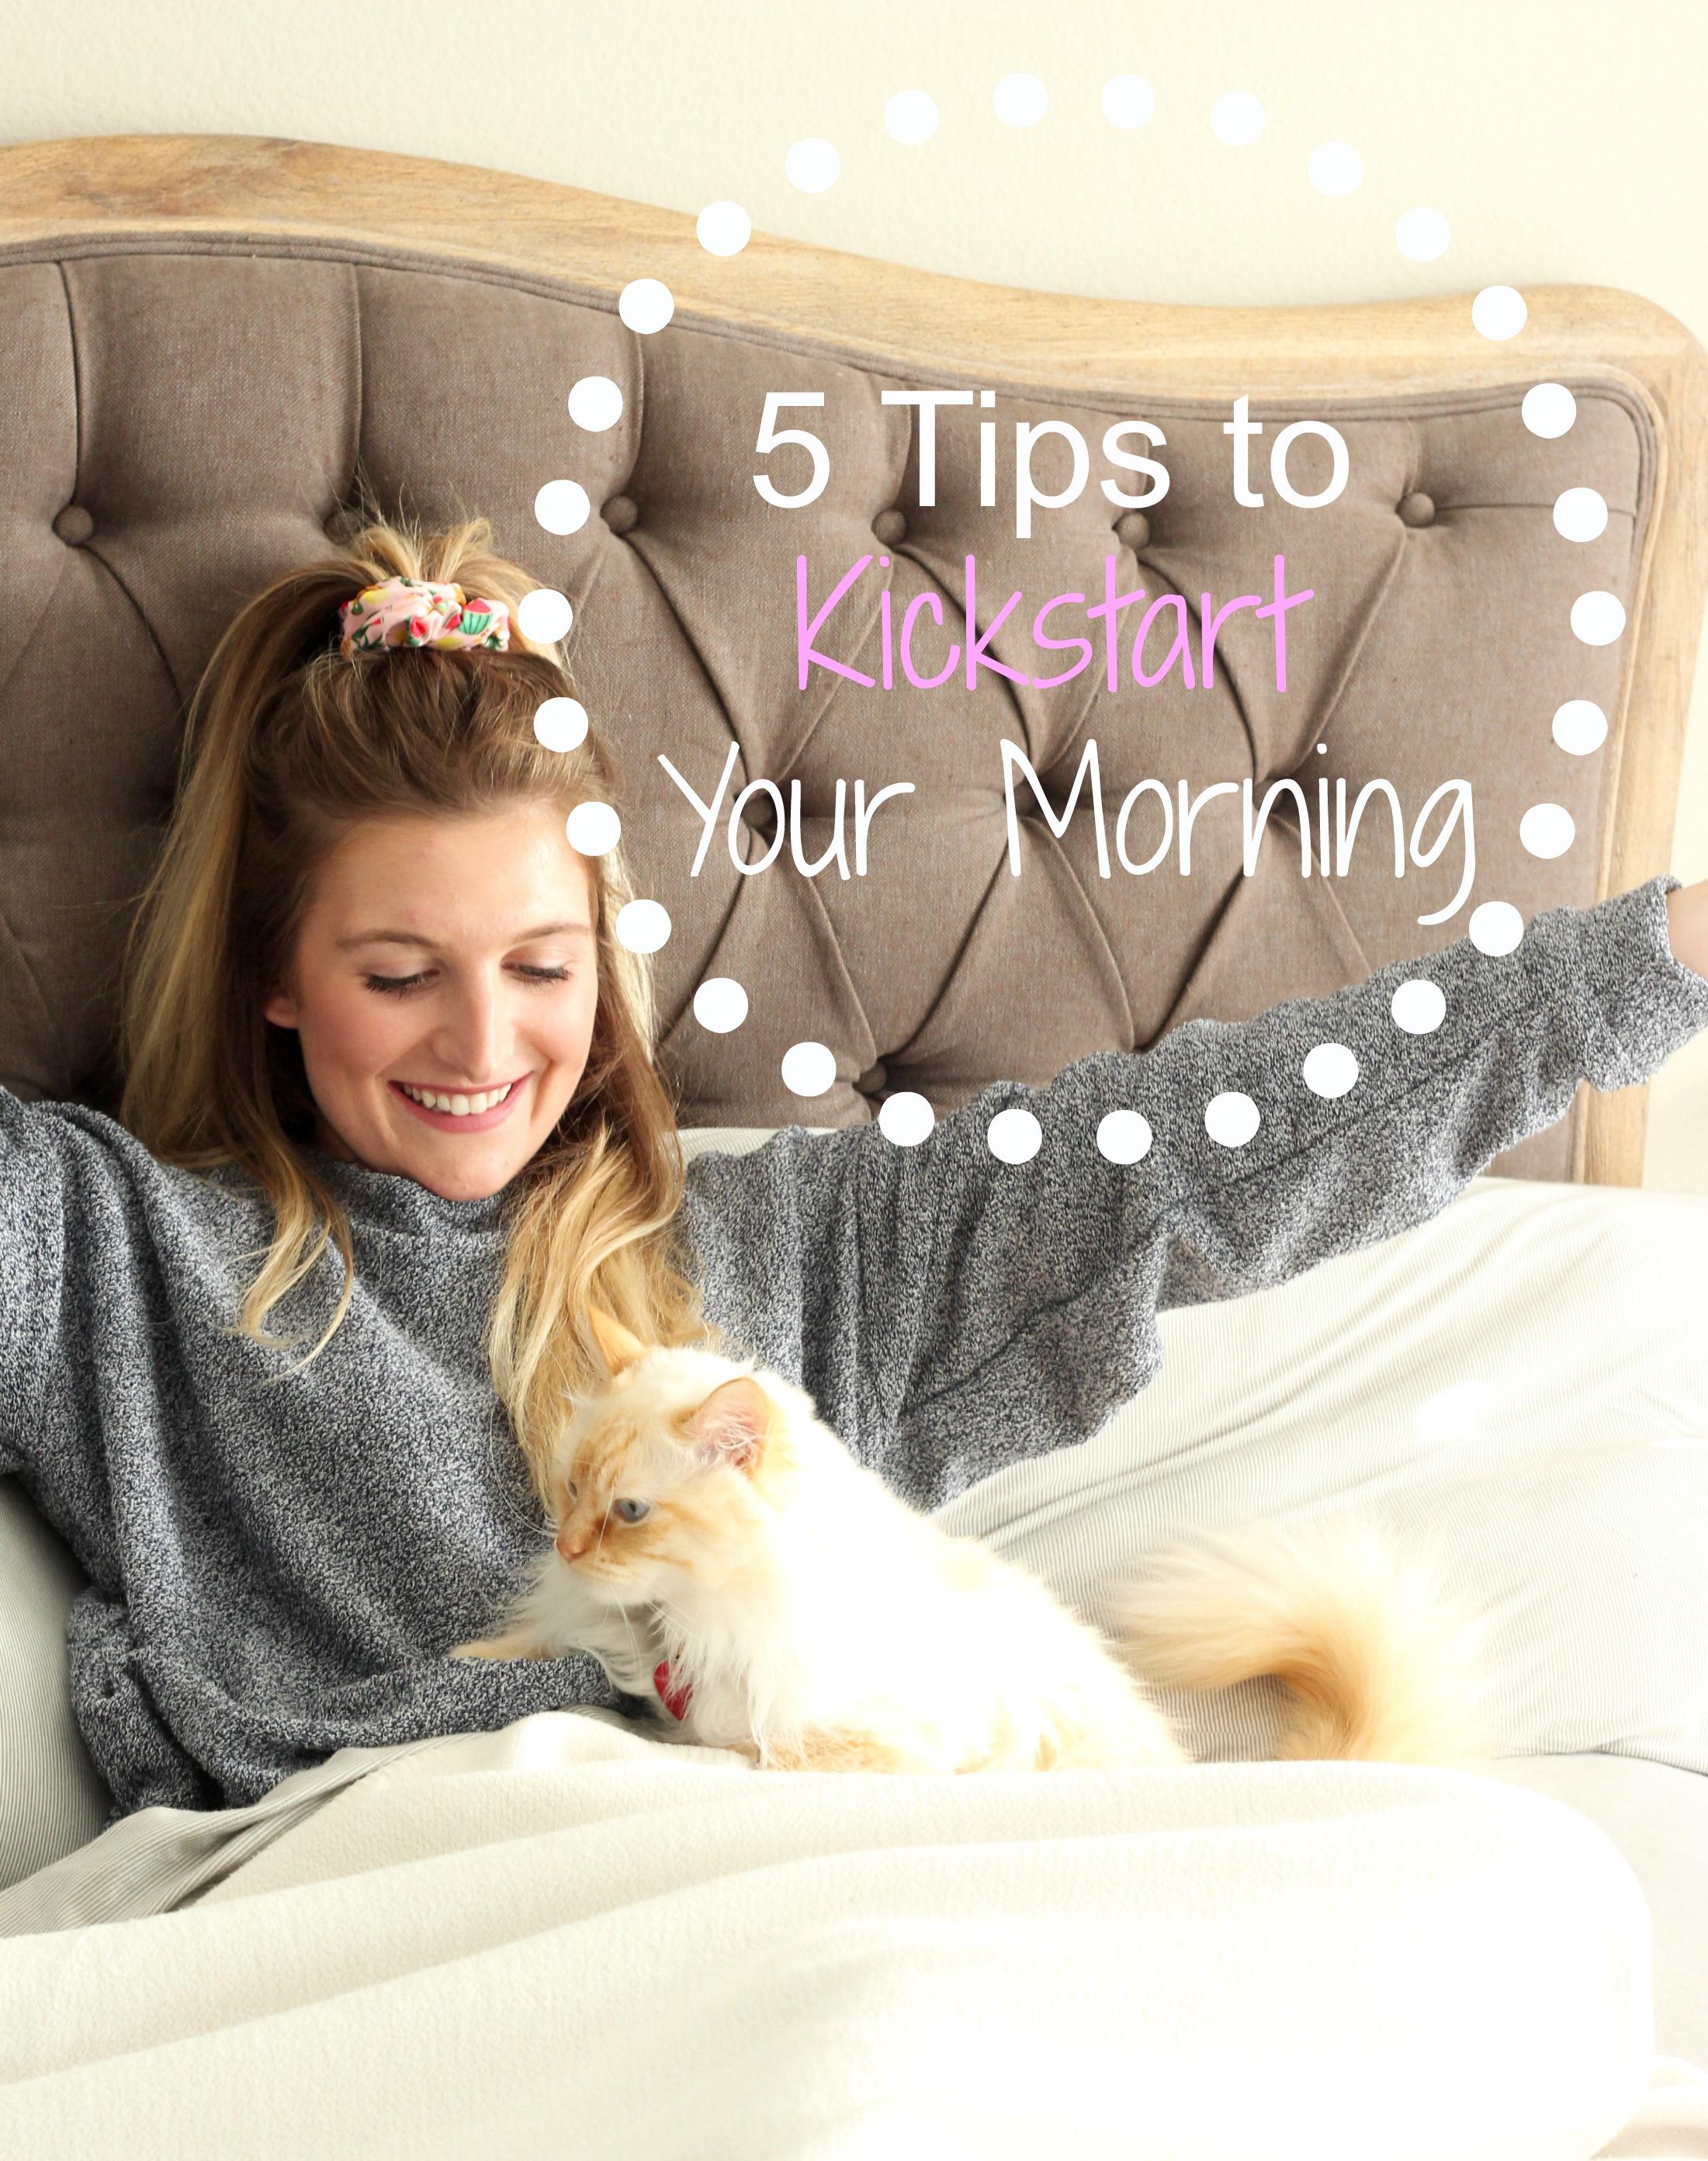 5 Tips to Kickstart your Morning | AMS Blog